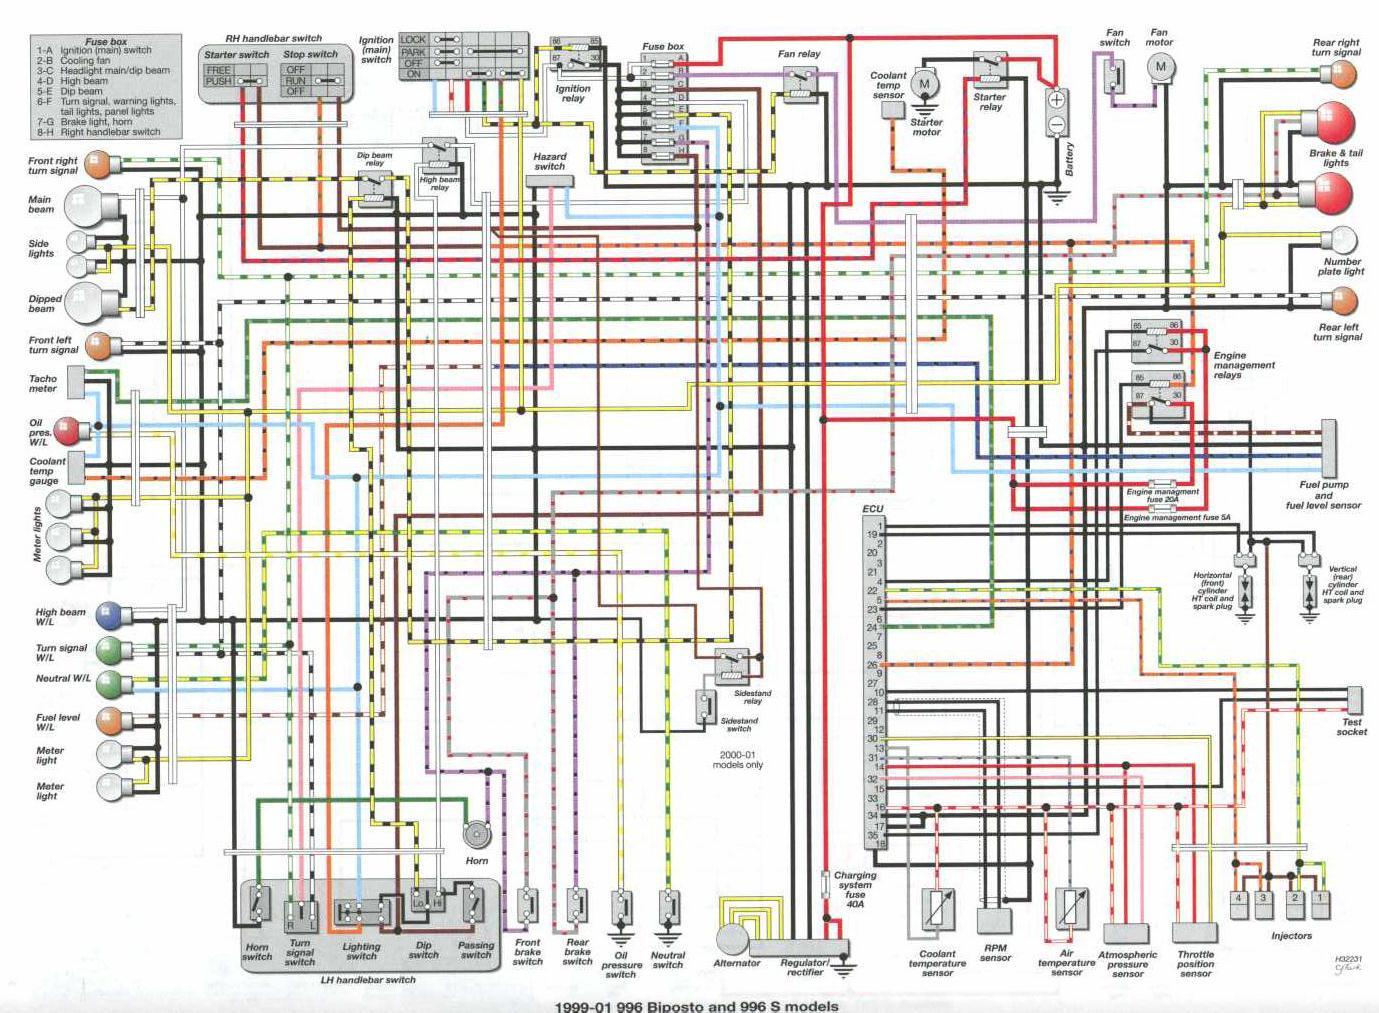 2001 996 neutral switch ducati ms the ultimate ducati forum rh ducati ms Turn Signal Wiring Diagram 1997 ducati 748 wiring diagram